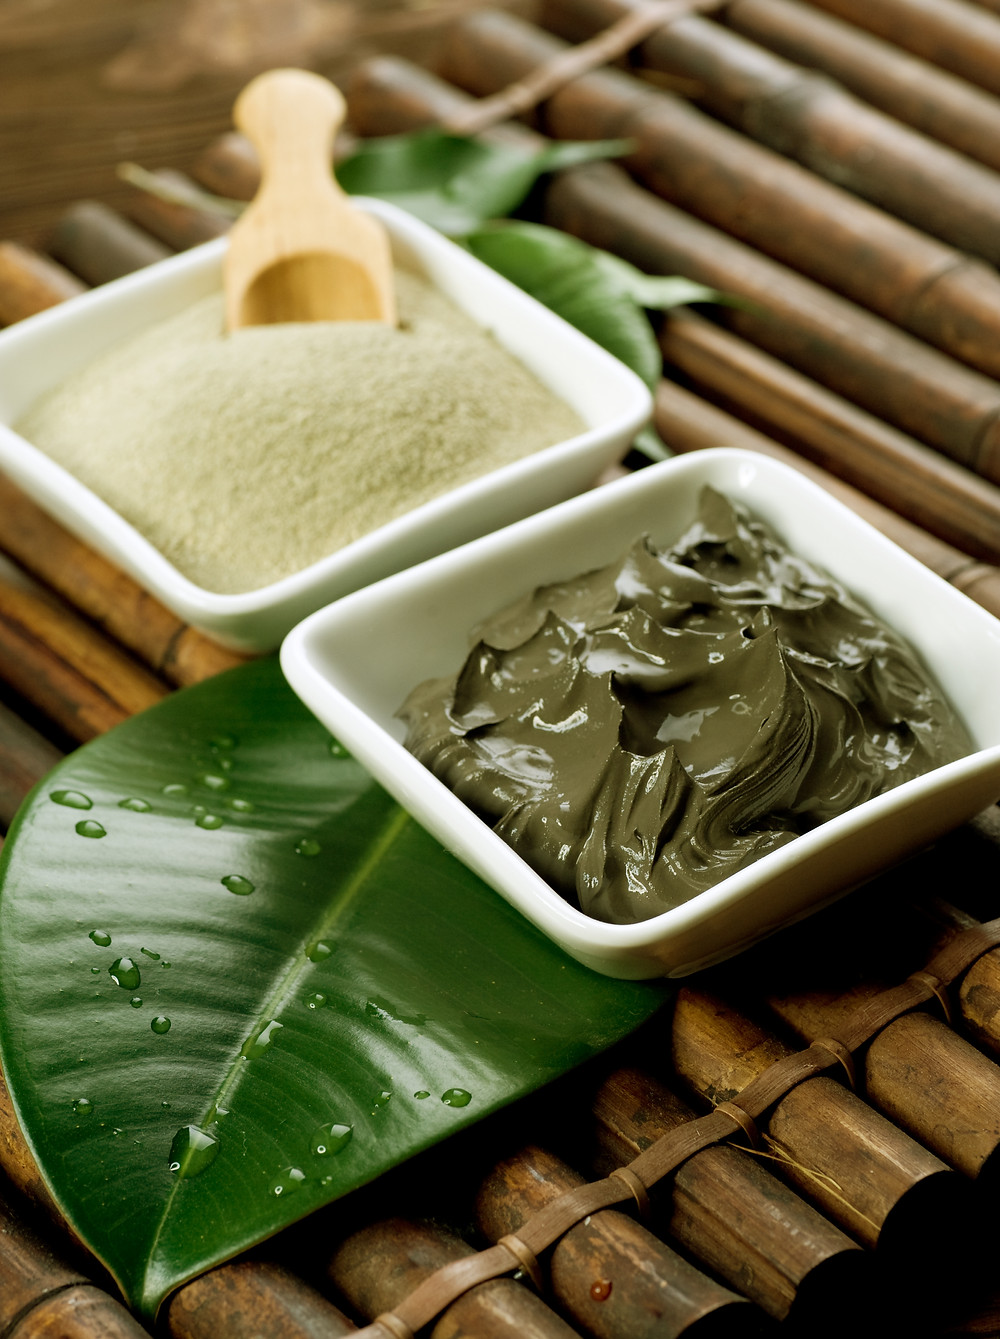 Argila verde terapêutica